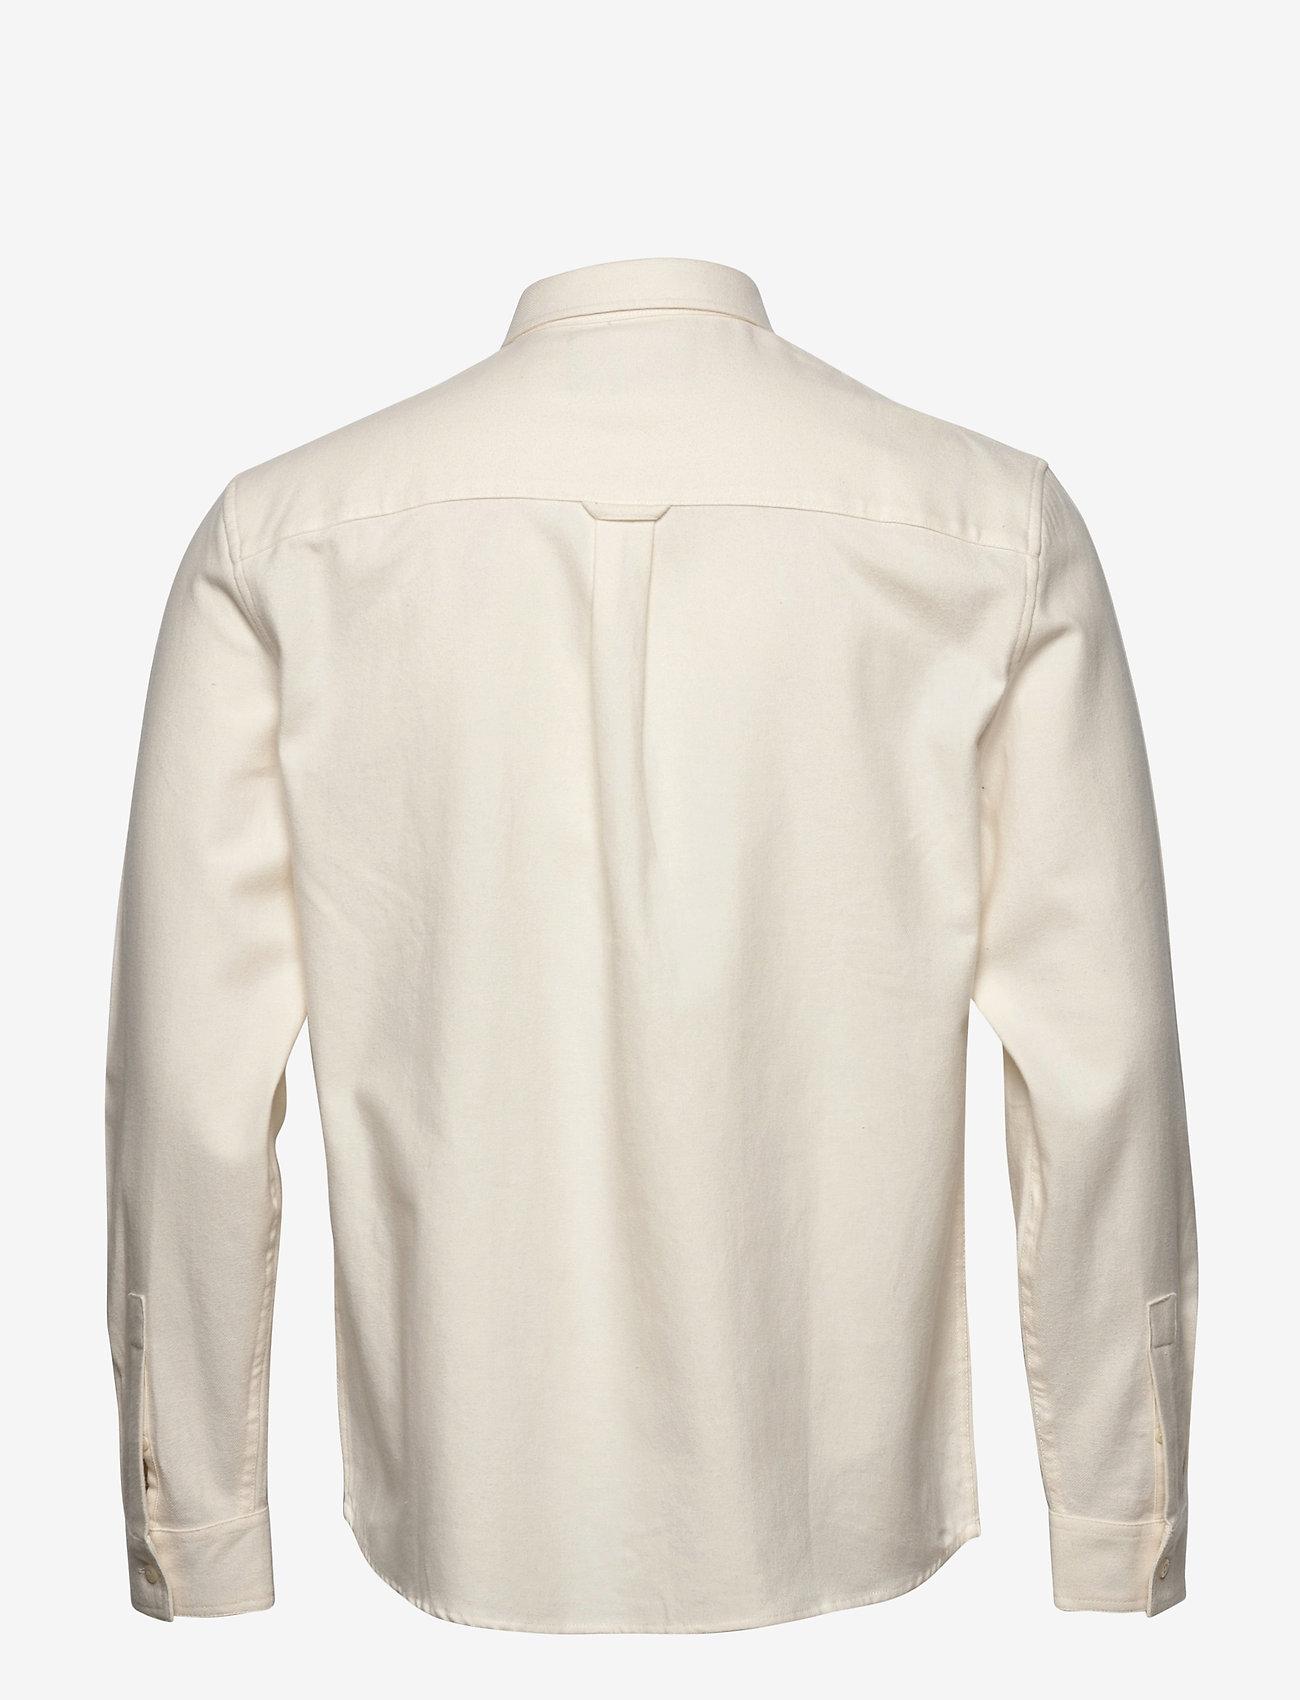 Lyle & Scott Brushed Twill Shirt - Skjorter VANILLA ICE - Menn Klær